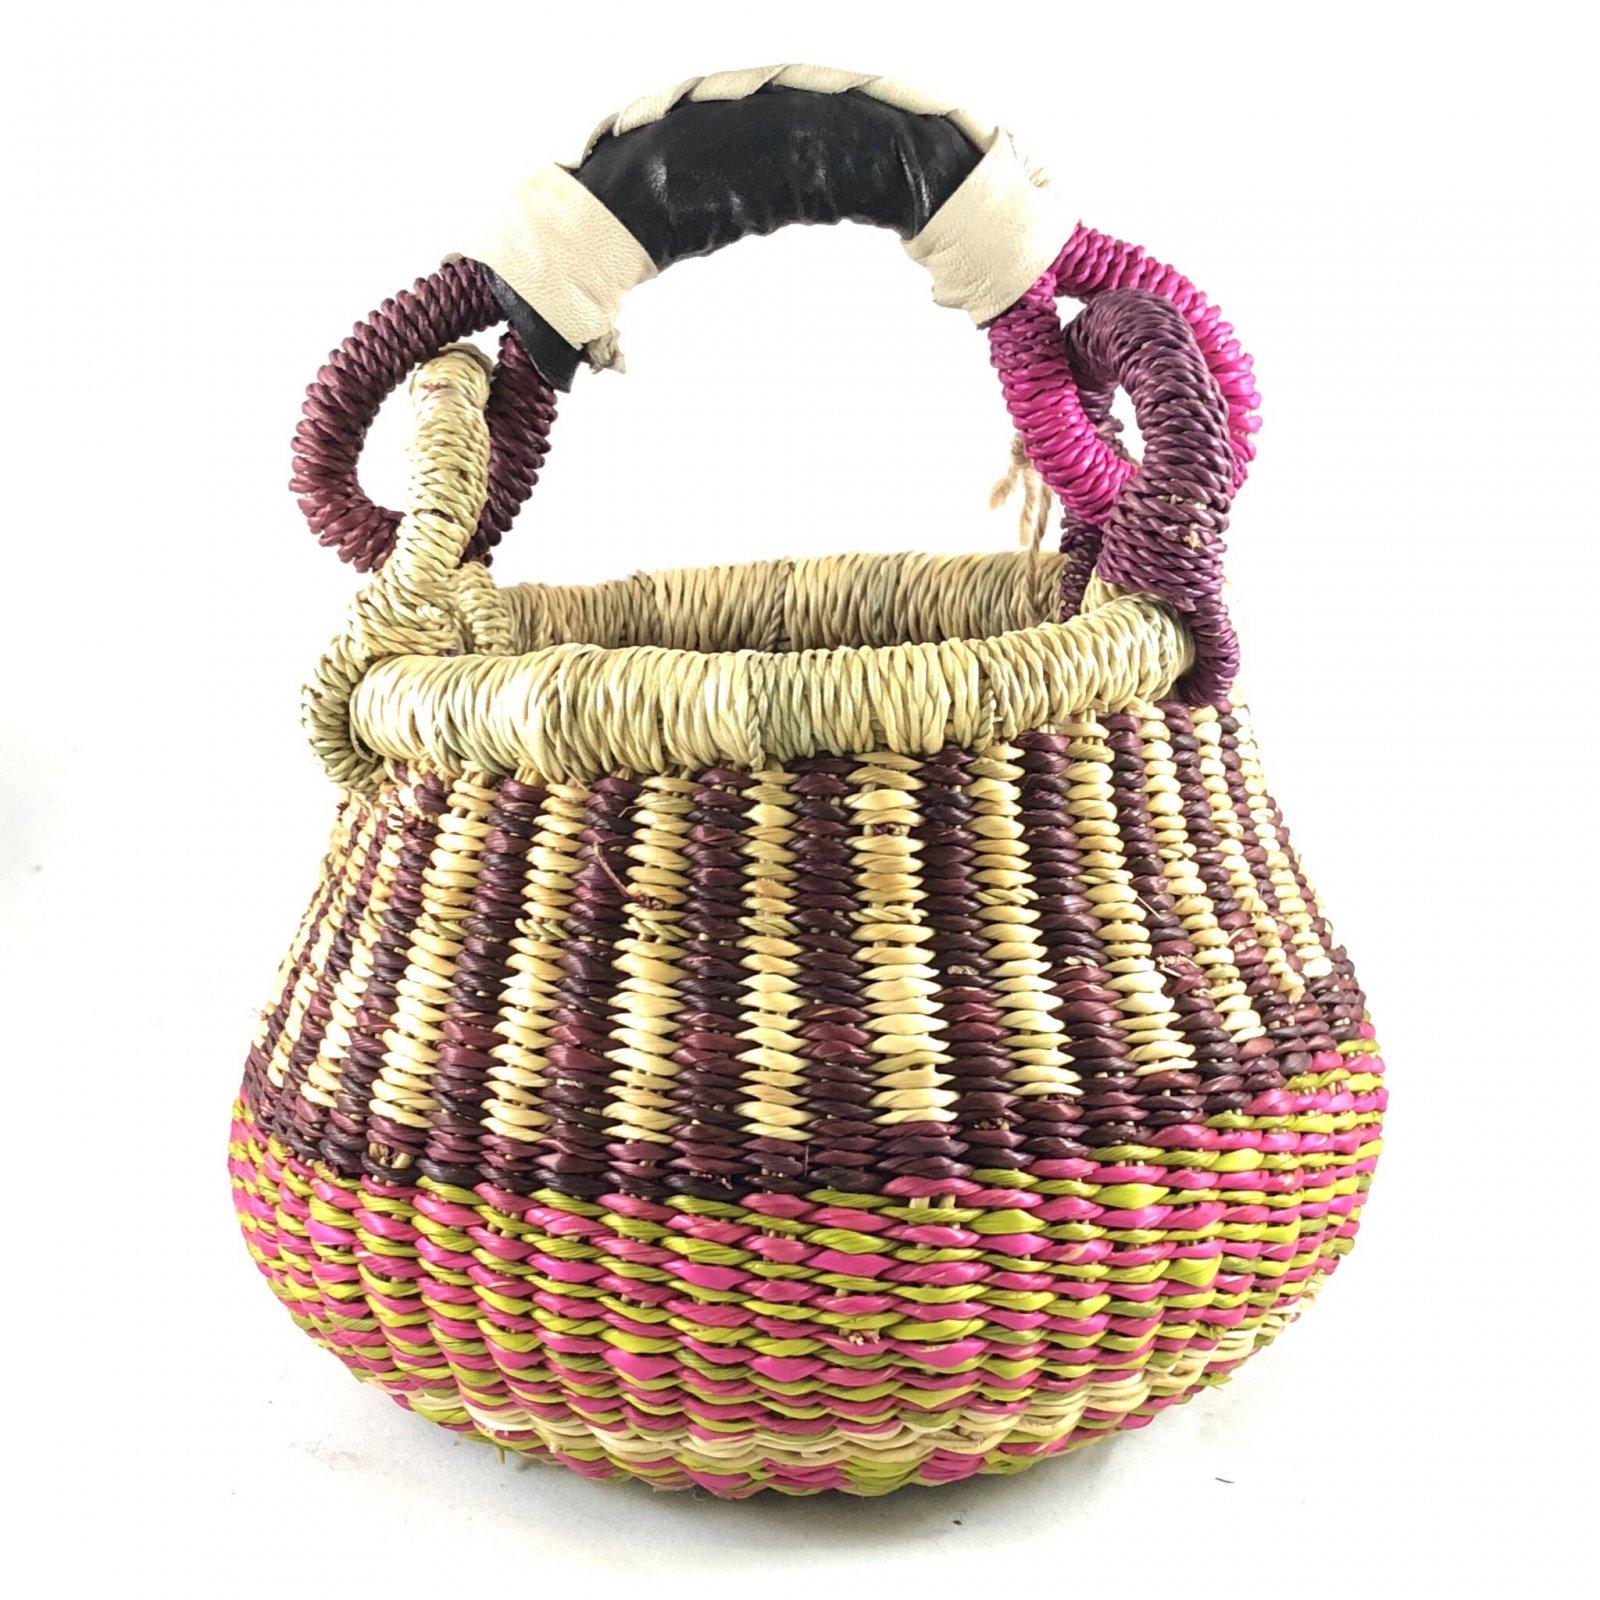 Pot Basket - Small - Online - Big Blue Moma